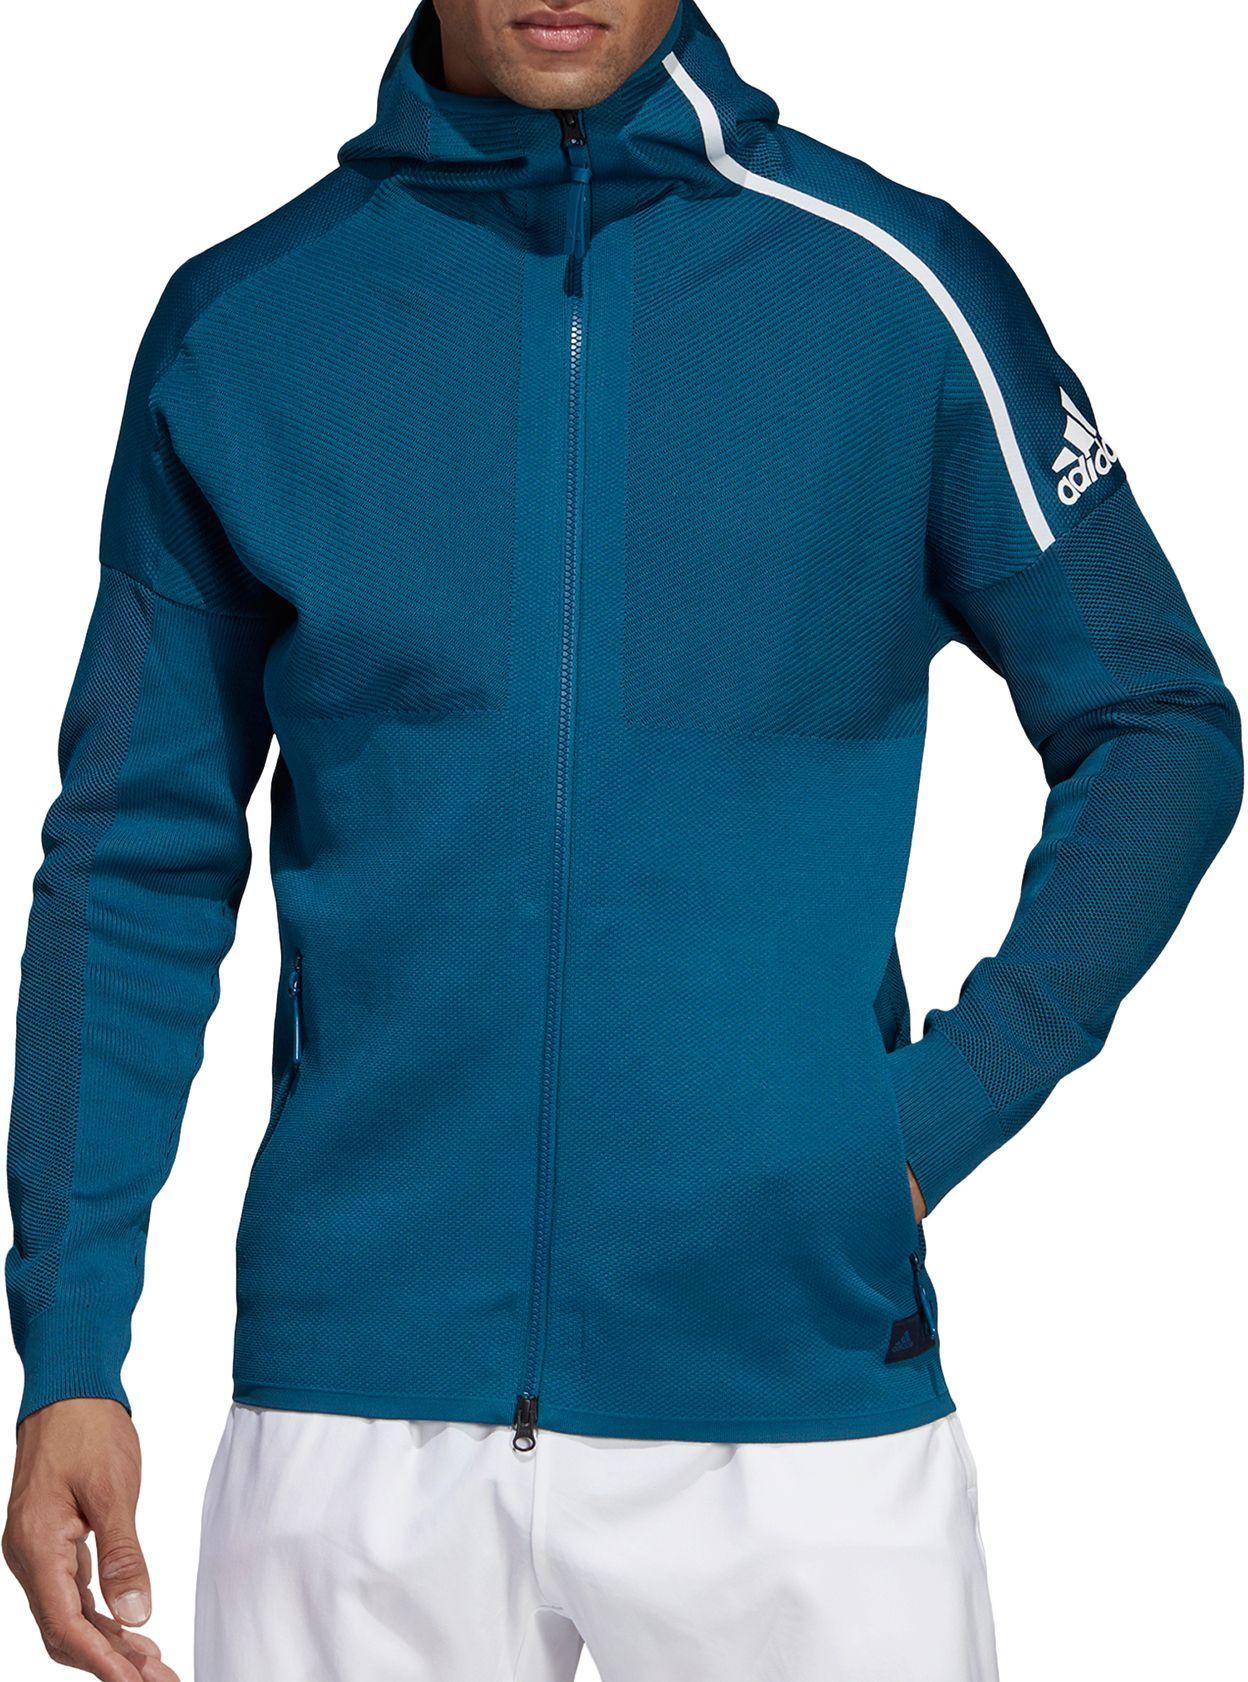 ADIDAS MENS Z.N.E. Parley Primeknit Hoodie Grey White Sports